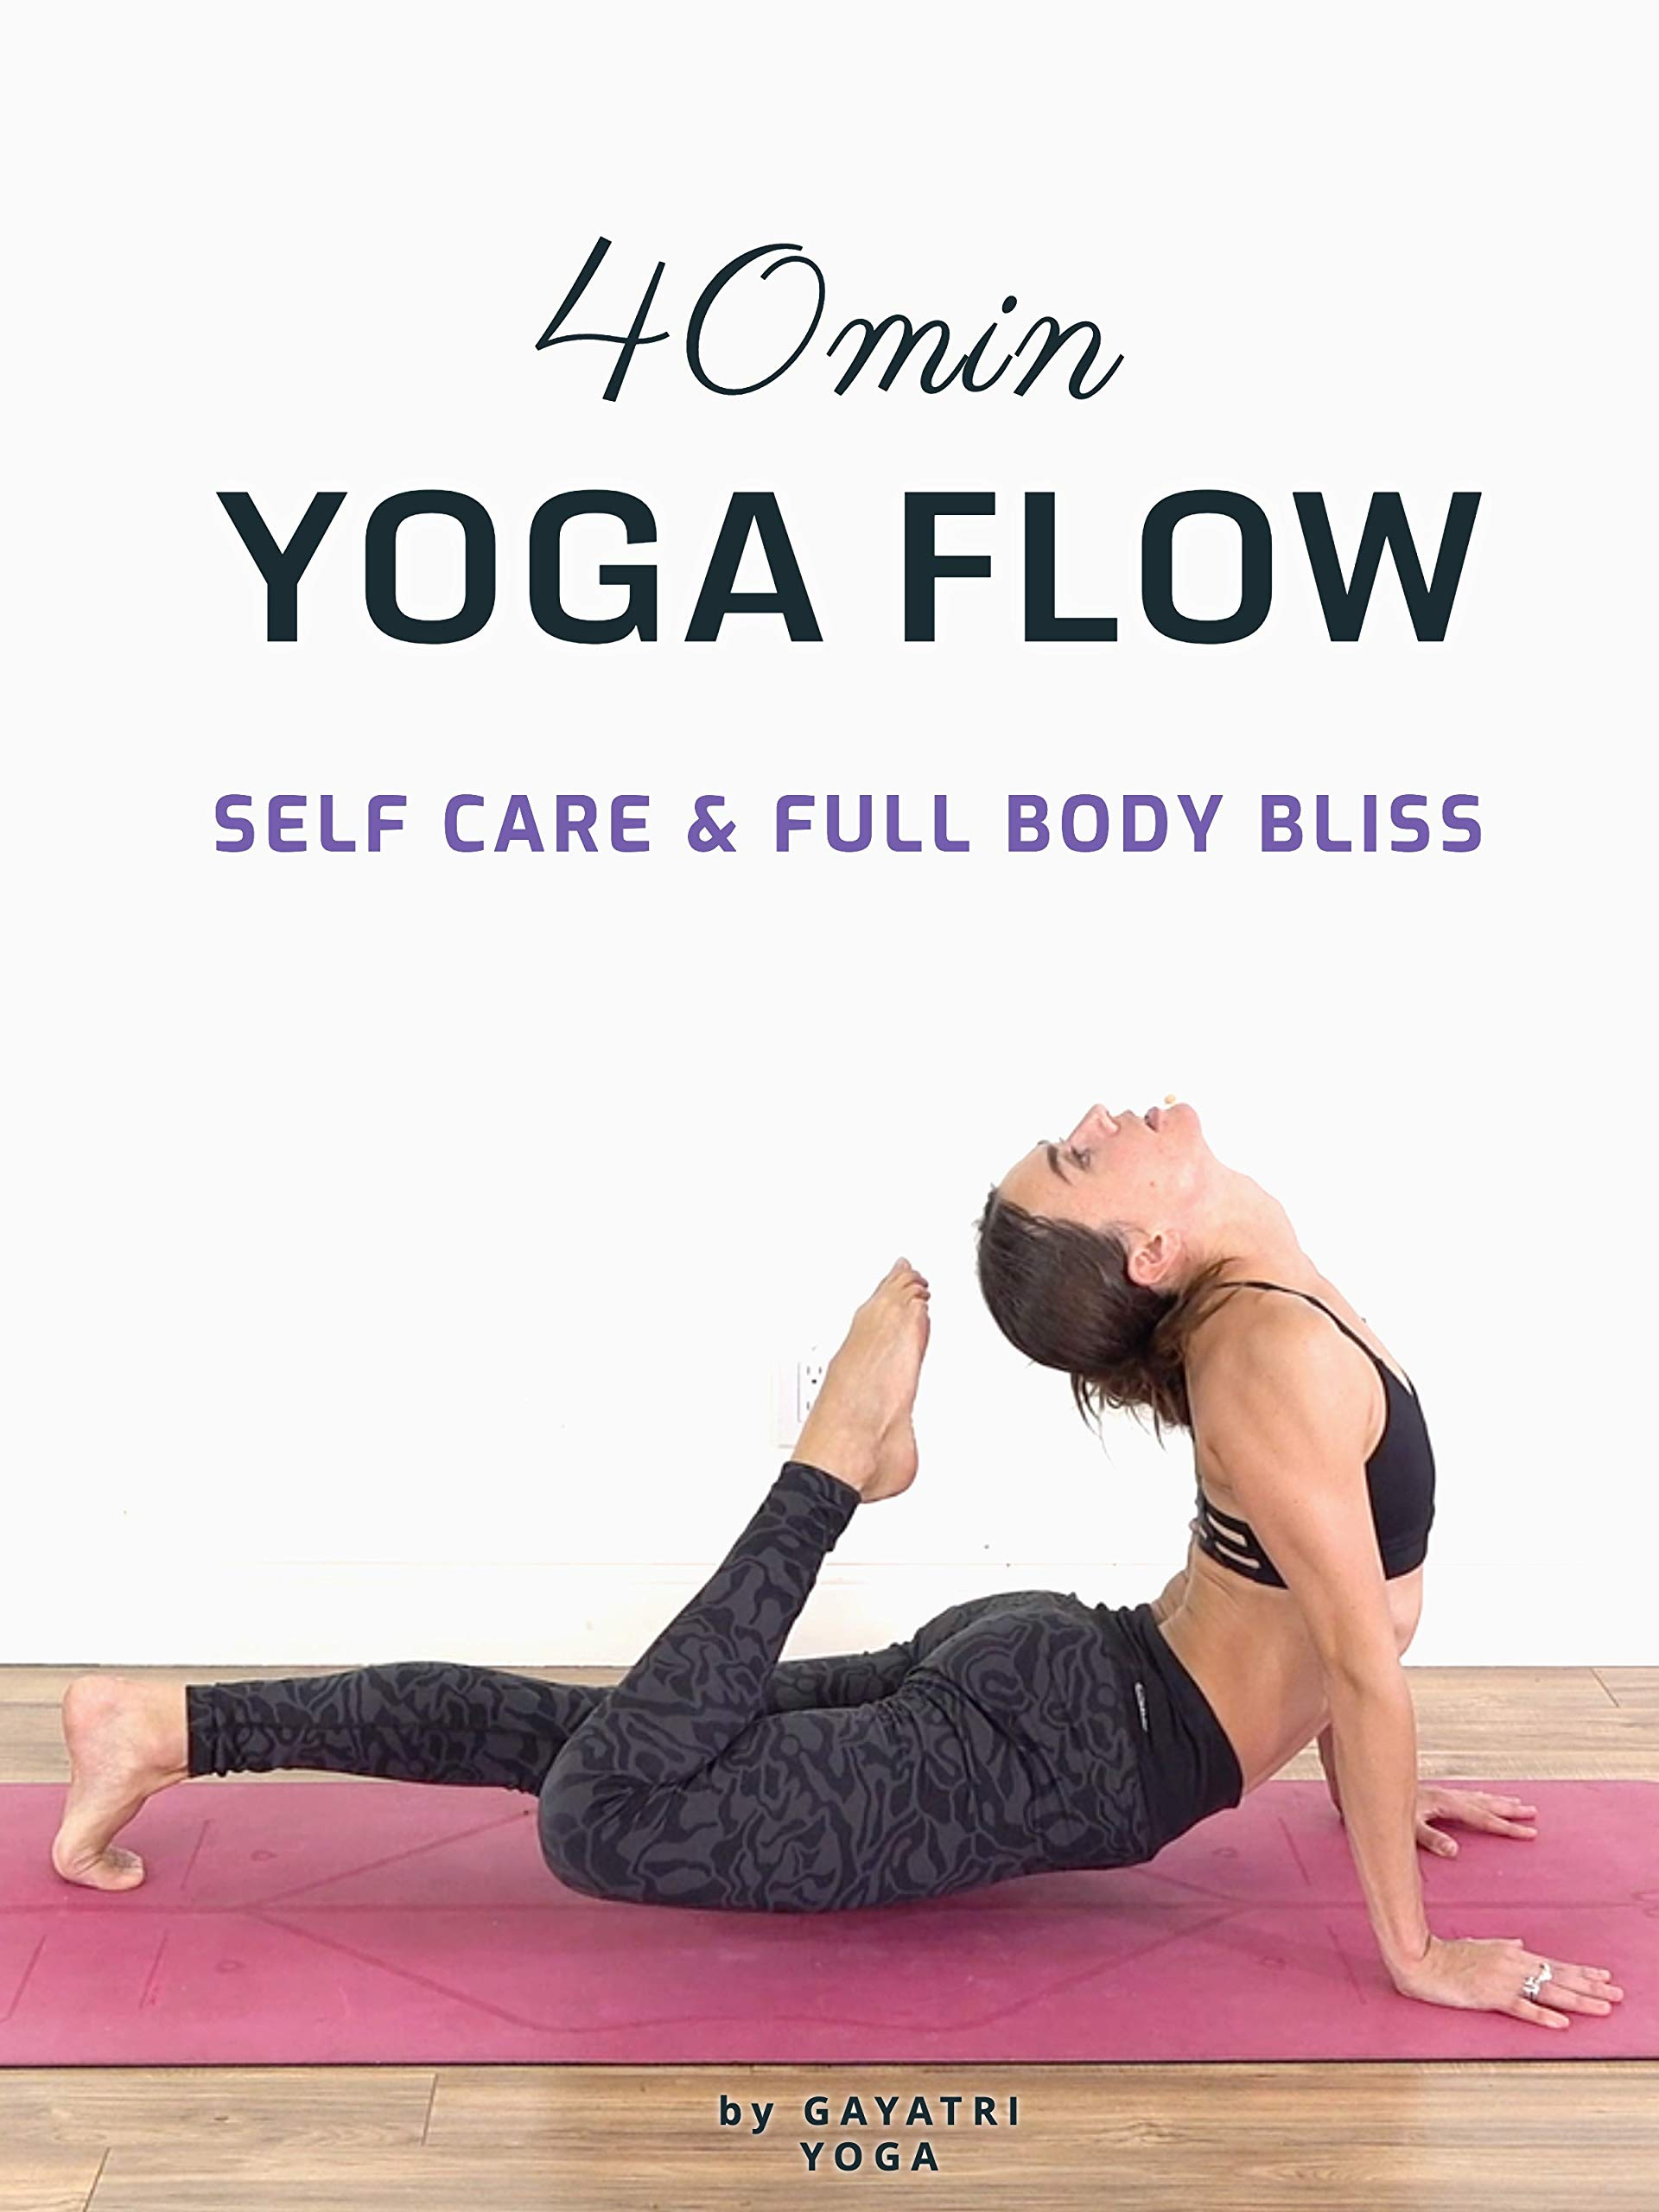 40 Min Yoga Flow - Self Care & Full Body Bliss - Gayatri Yoga